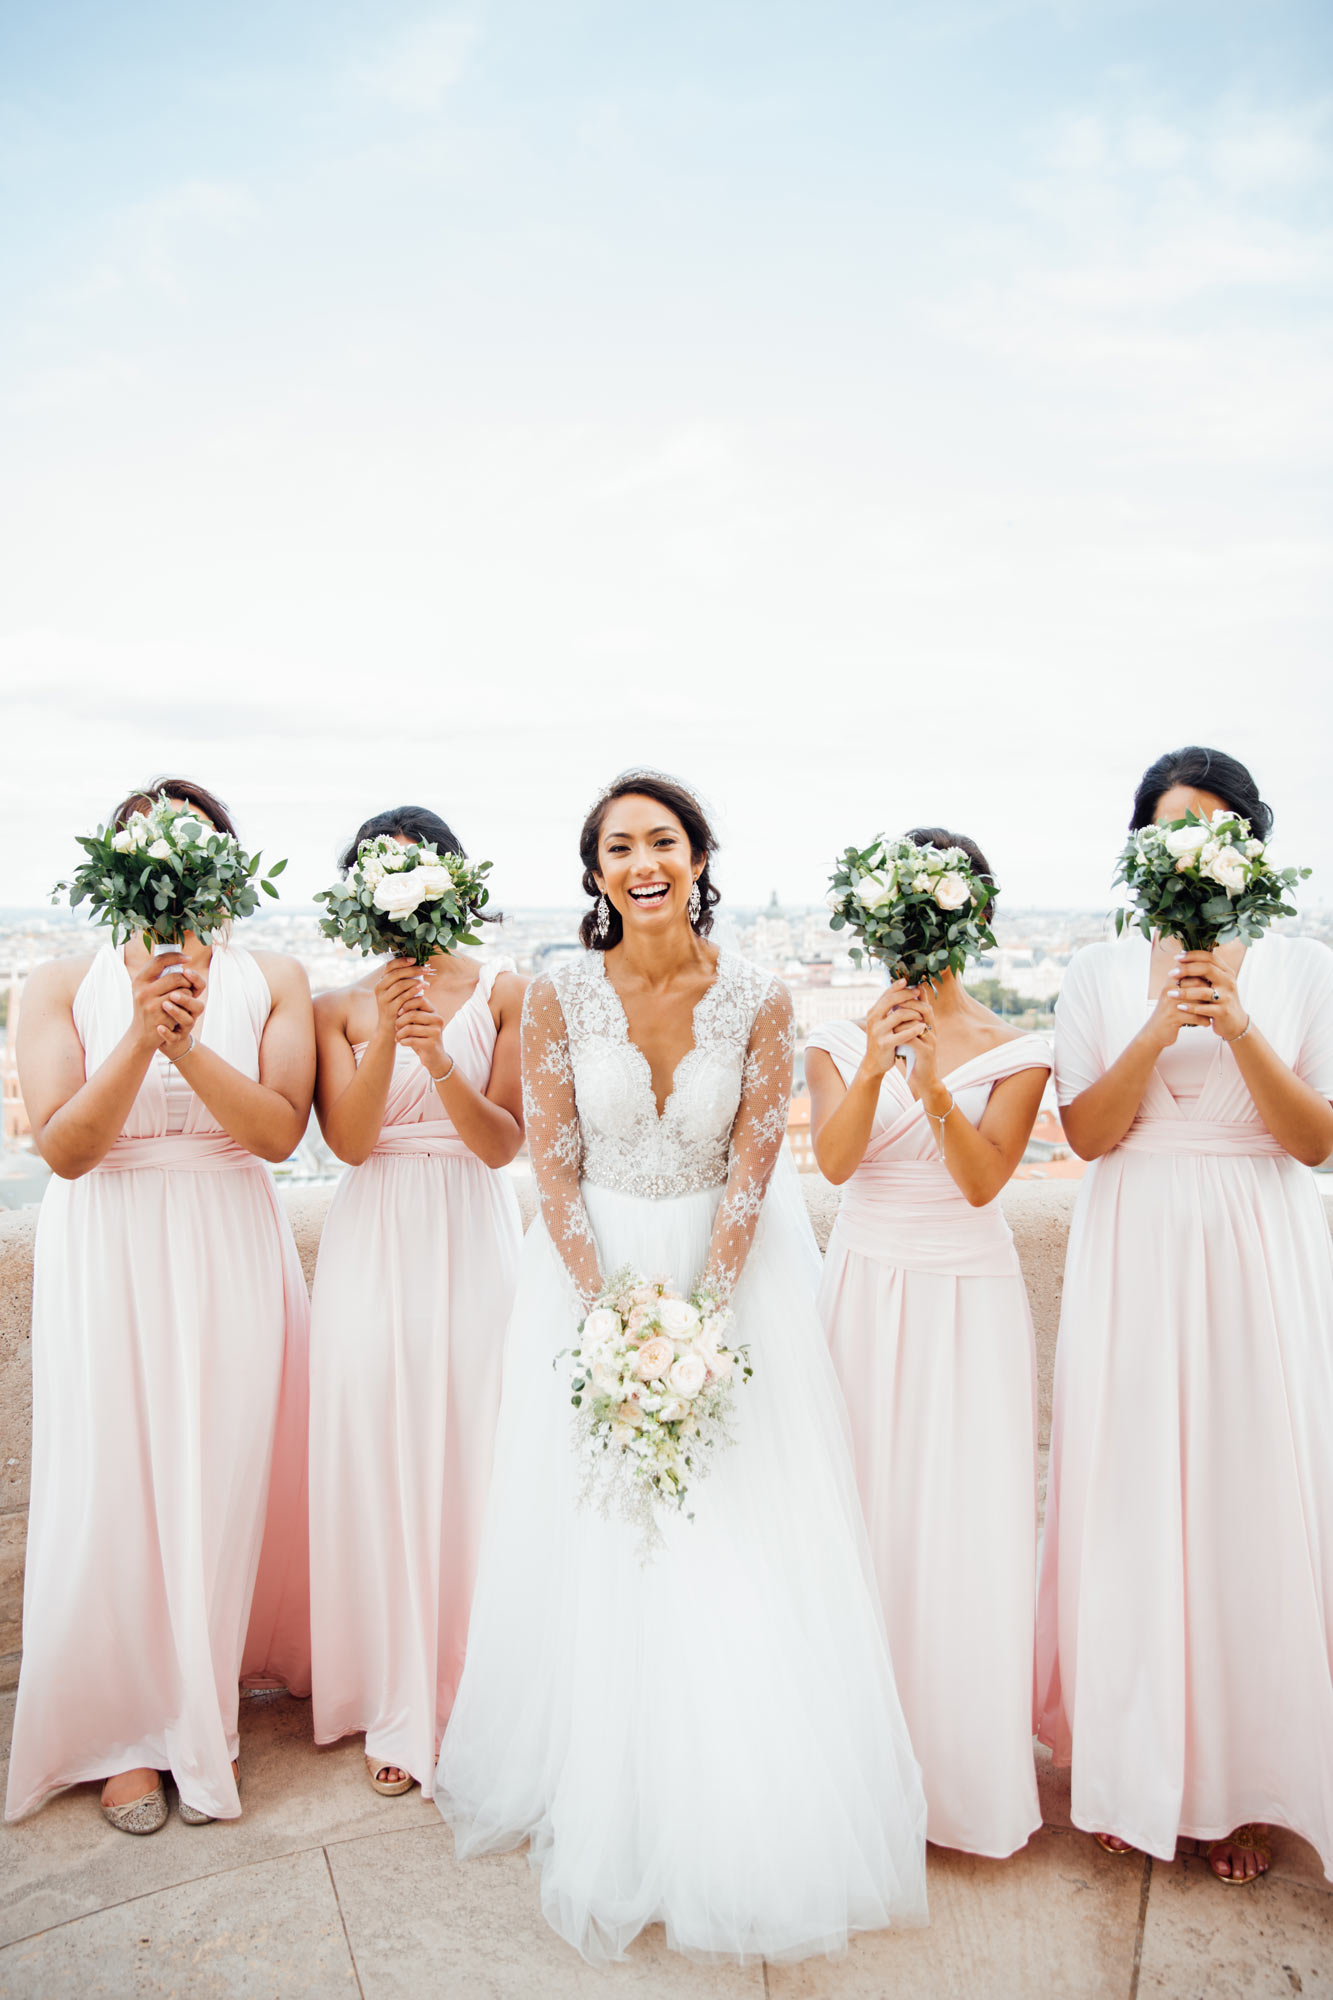 BeckyLee-wedding.jpg